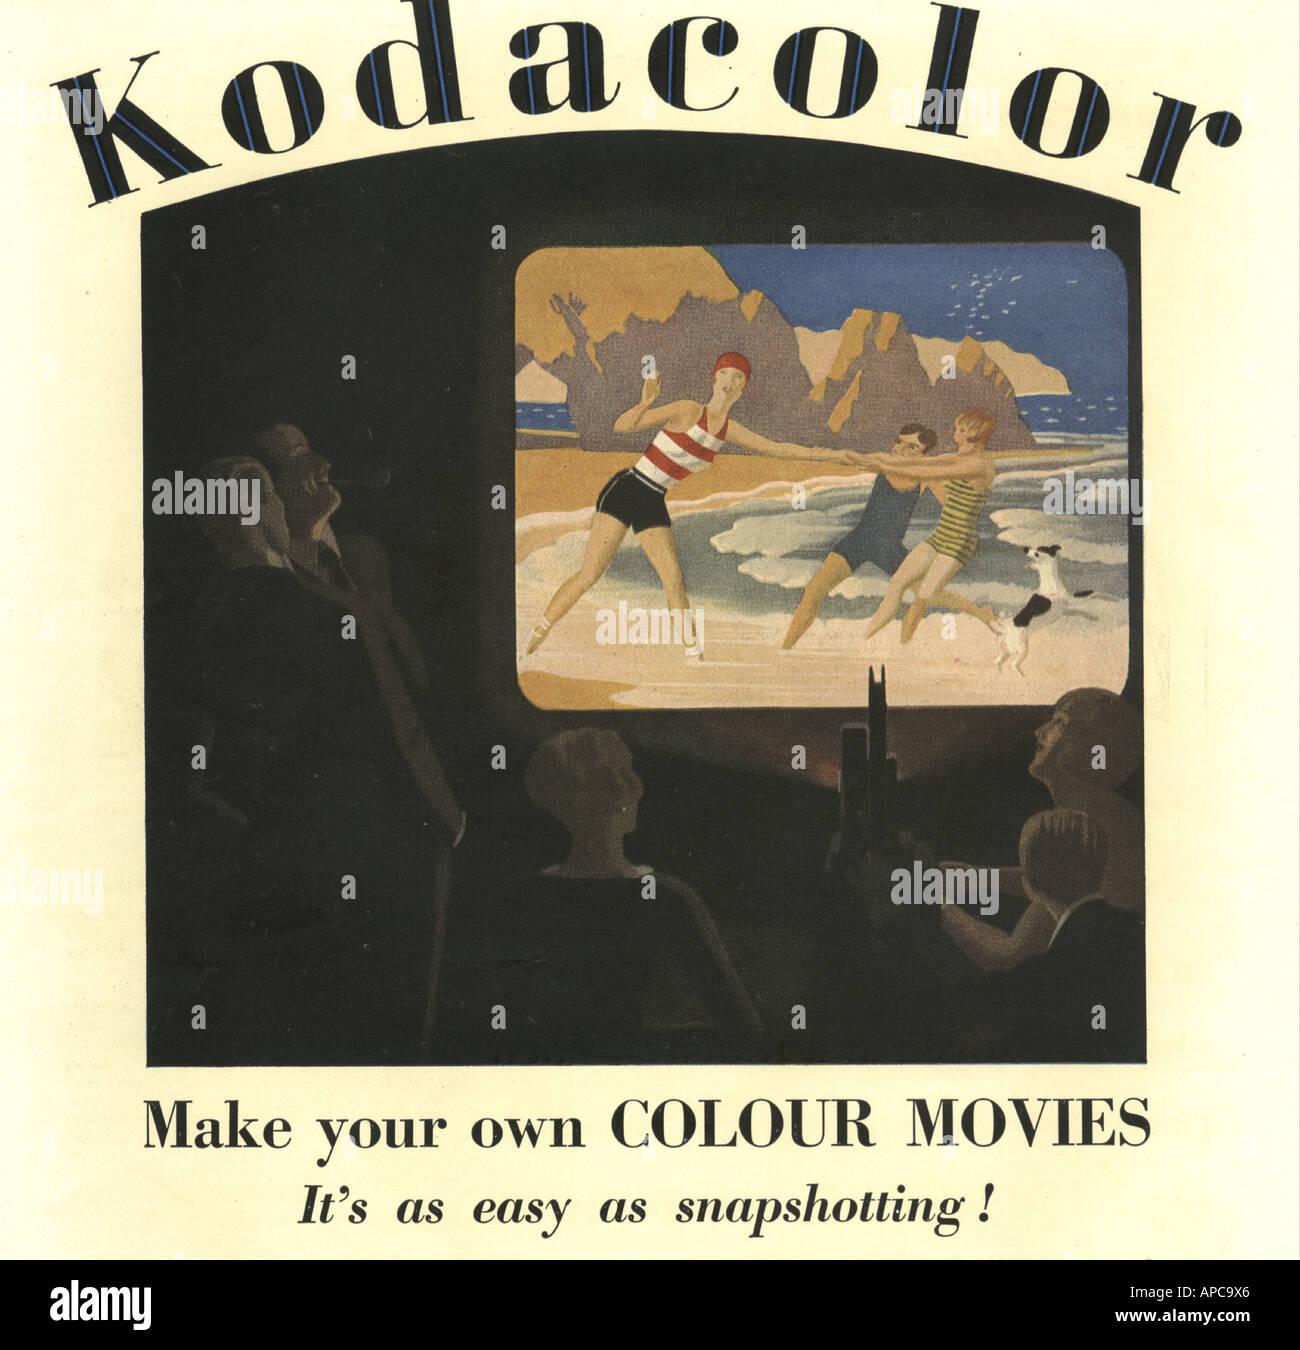 Kodacolor Werbung für Farbe Filme 1929 Stockbild